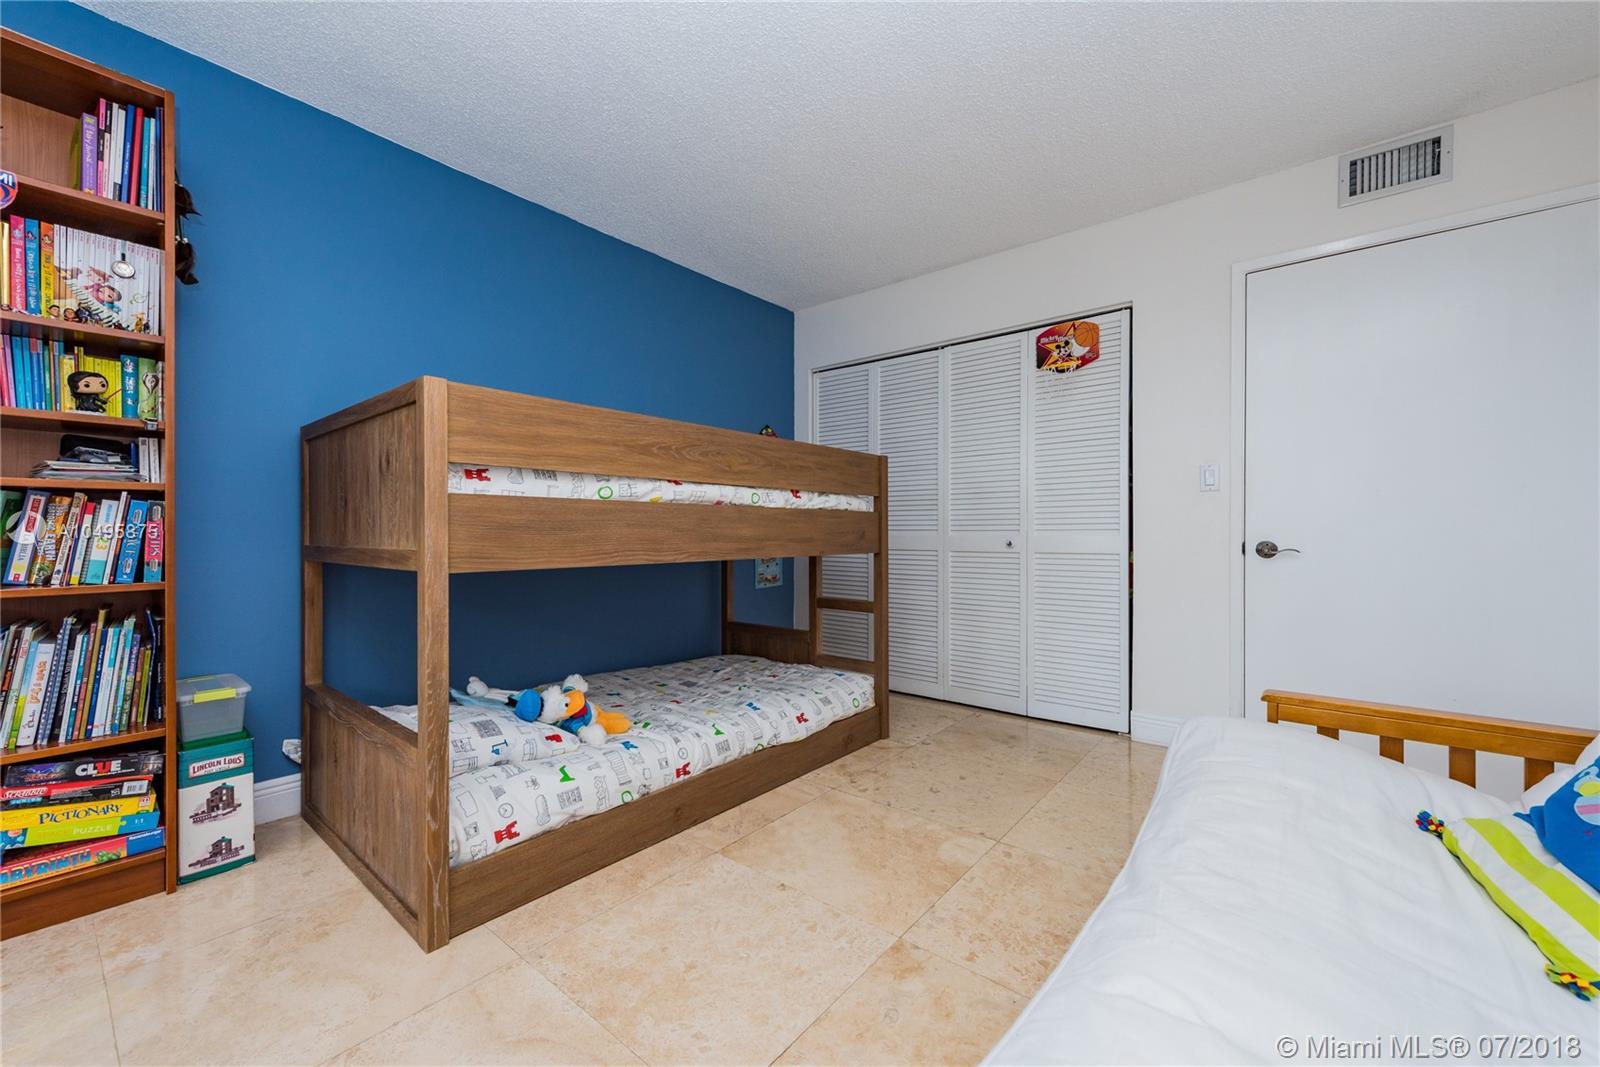 1901 Brickell Ave, Miami. FL 33129, Brickell Place I #B808, Brickell, Miami A10495875 image #25